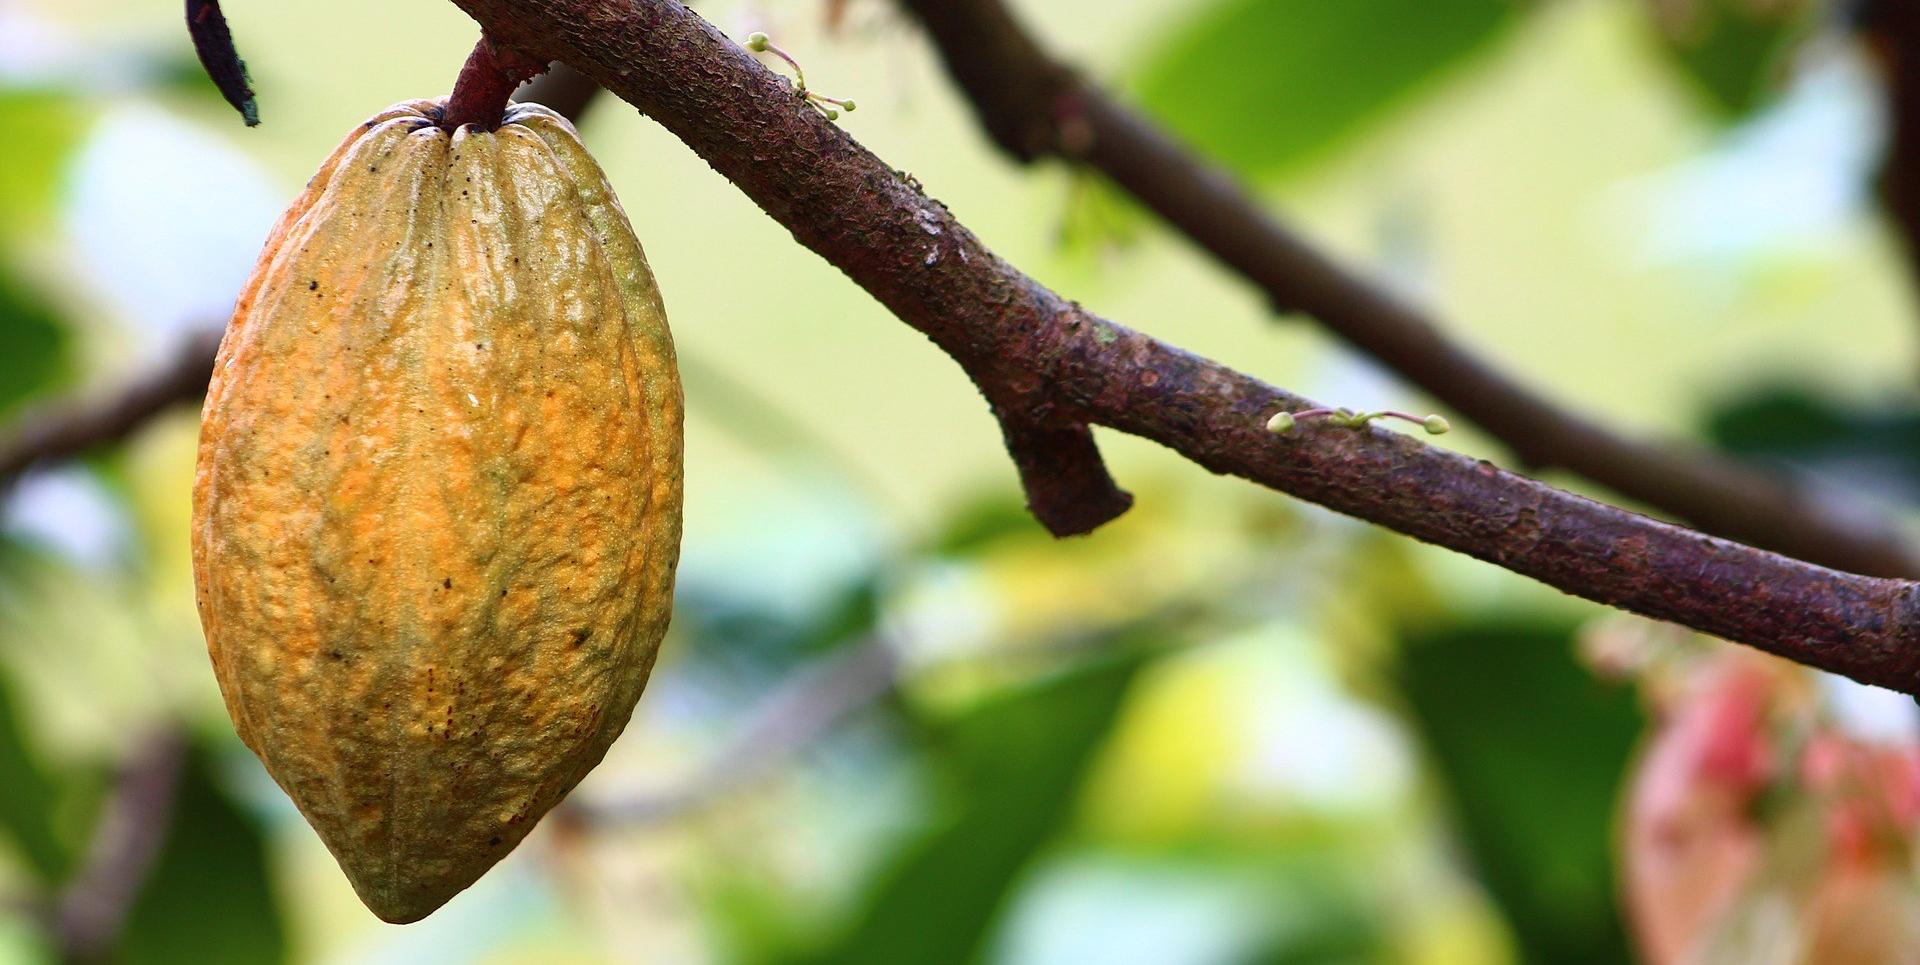 cocoa-1529742_1920.jpg